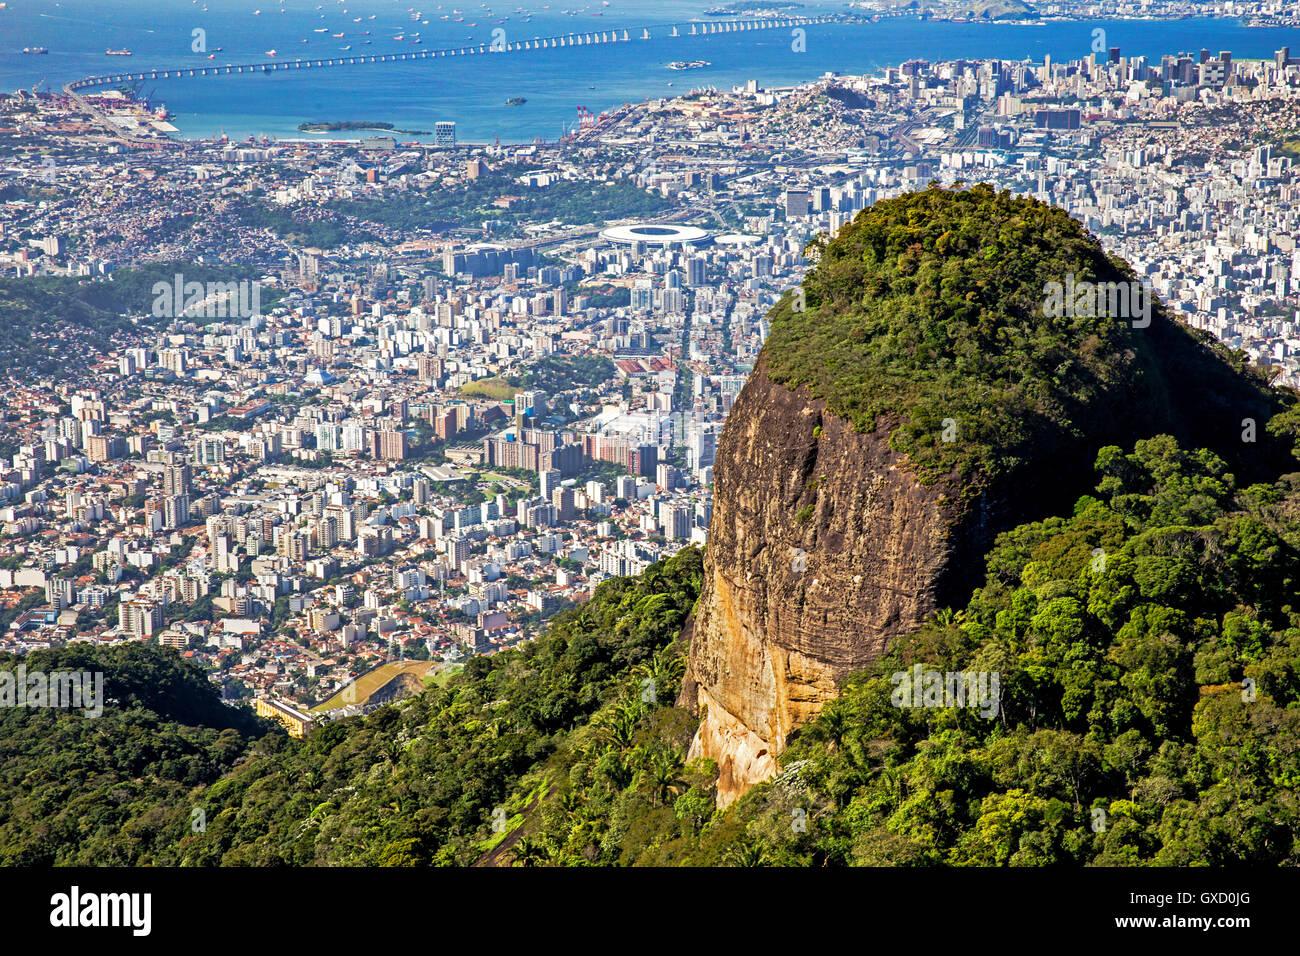 La baie de Guanabara, Maracana, Rio-Pont Niterói, Zona Norte, Tijuana, Rio de Janeiro, Brésil Photo Stock